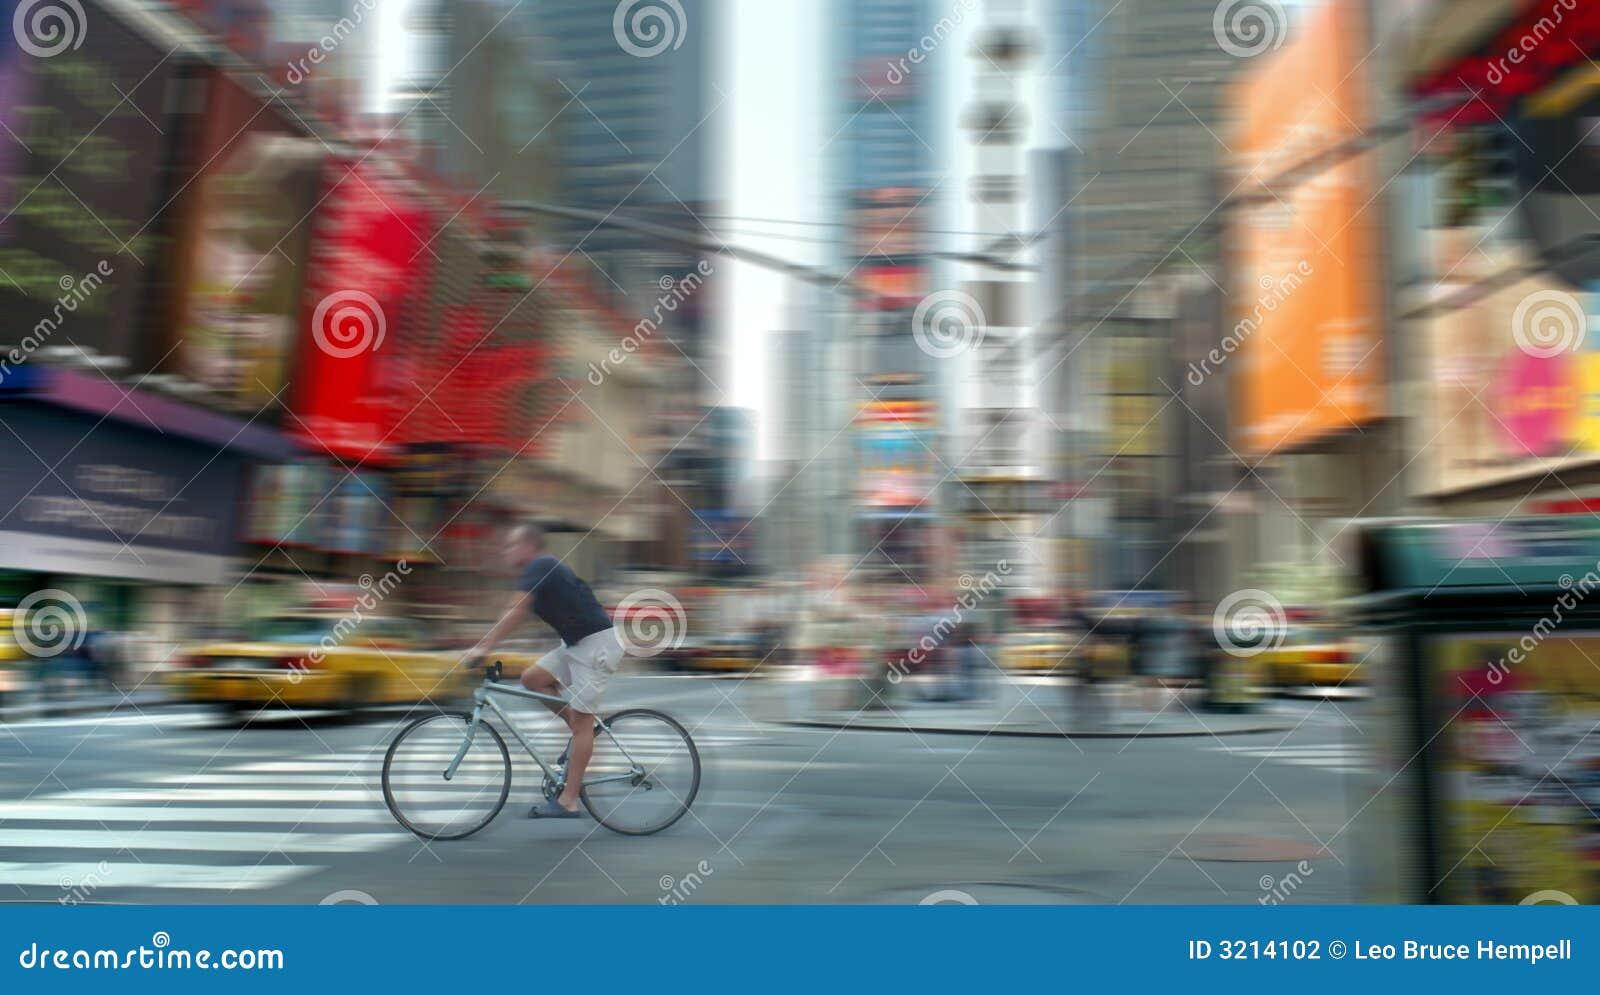 Nya fyrkantiga tider york för cykelblur